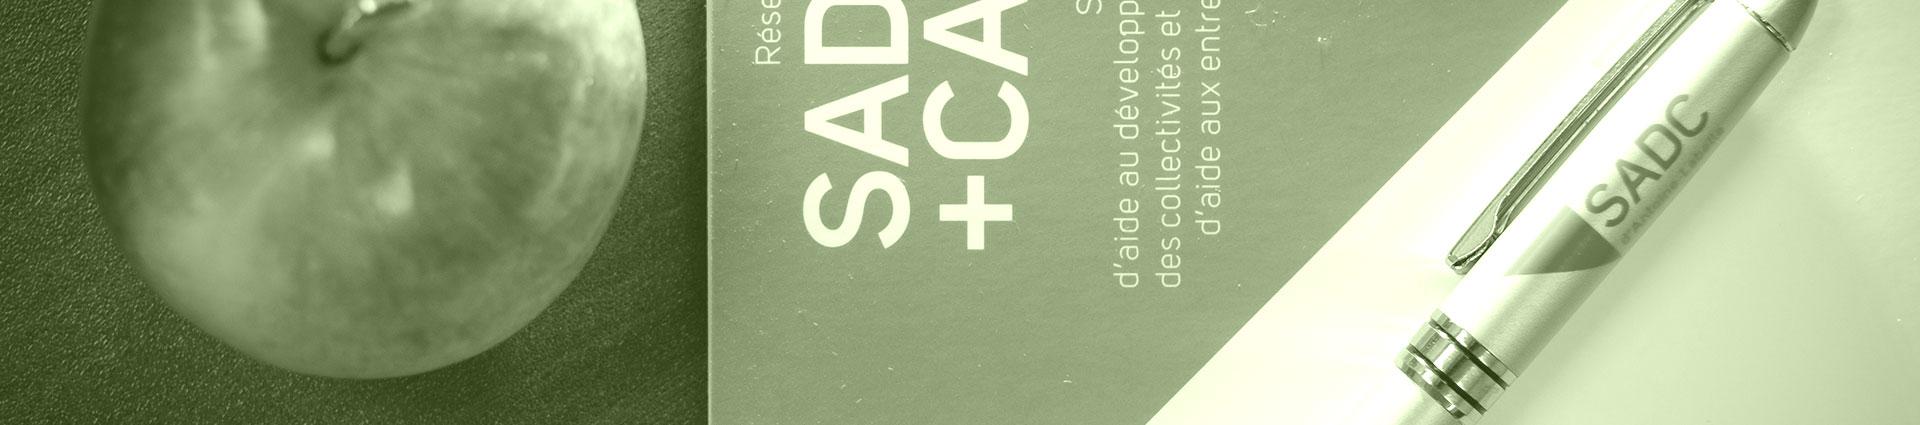 sadc-antoine-labelle-votre-SADC